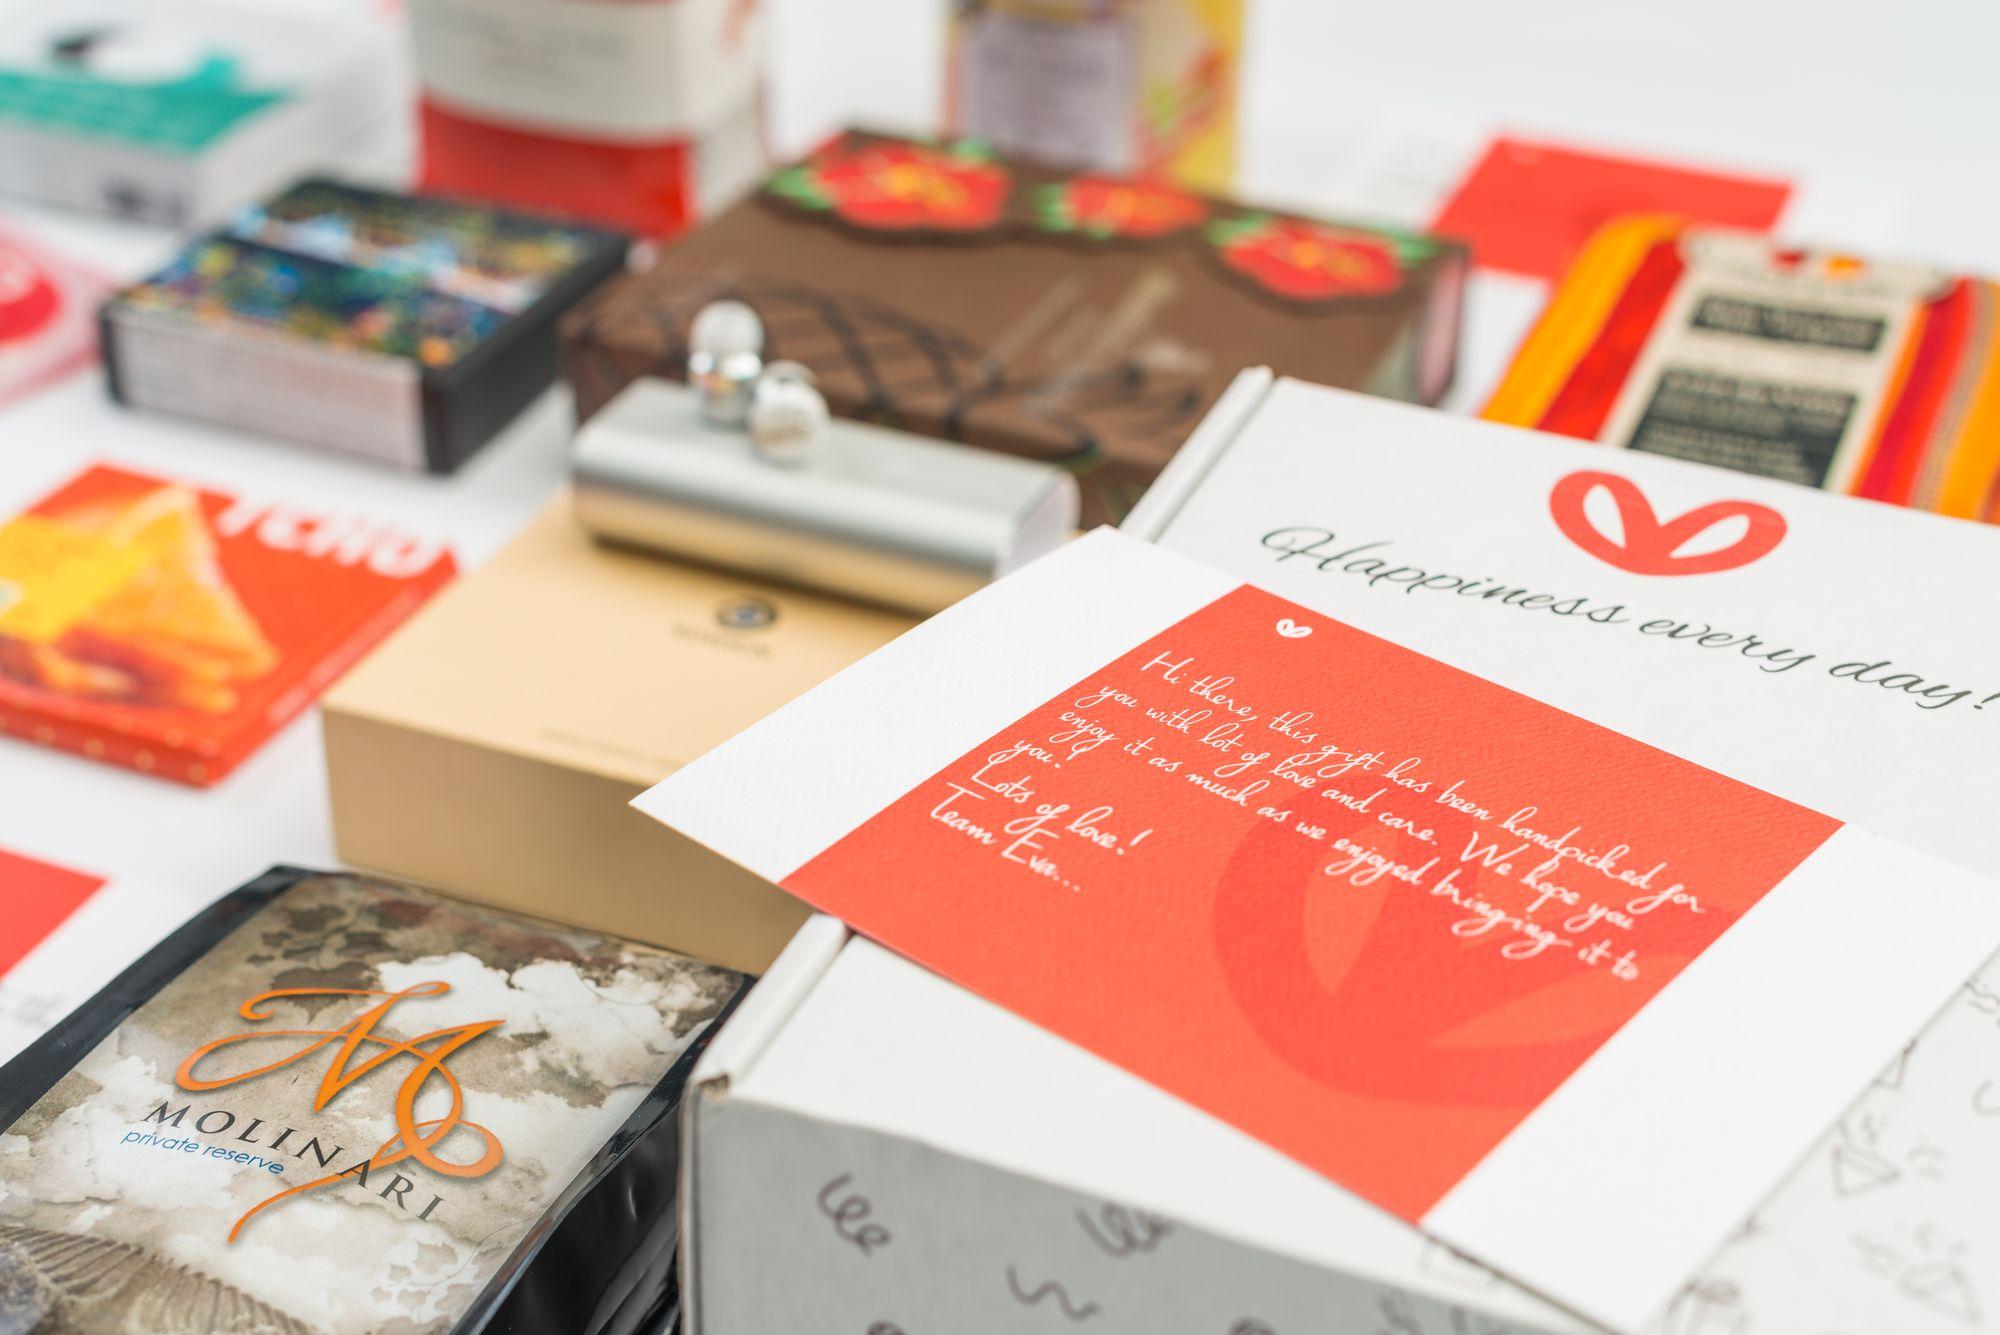 Eva's data-driven Holiday Gift Guides